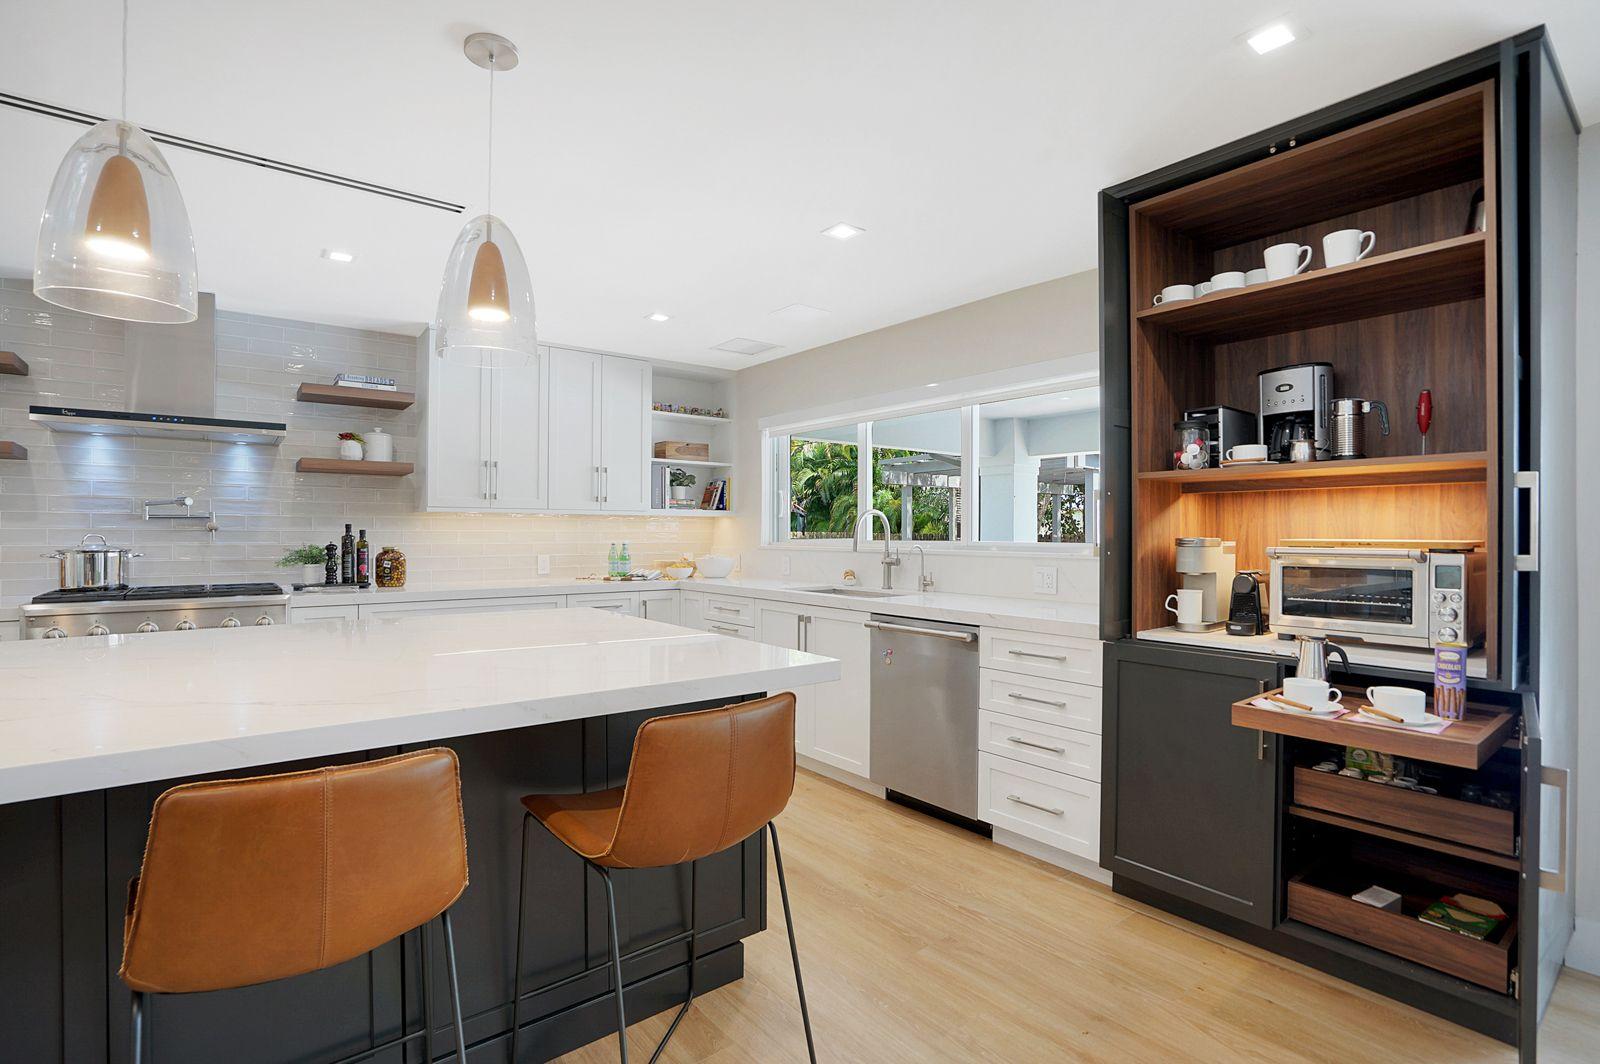 Custom Kitchen Cabinets in Pinecrest, Key Largo, Palmetto Bay, Kendall